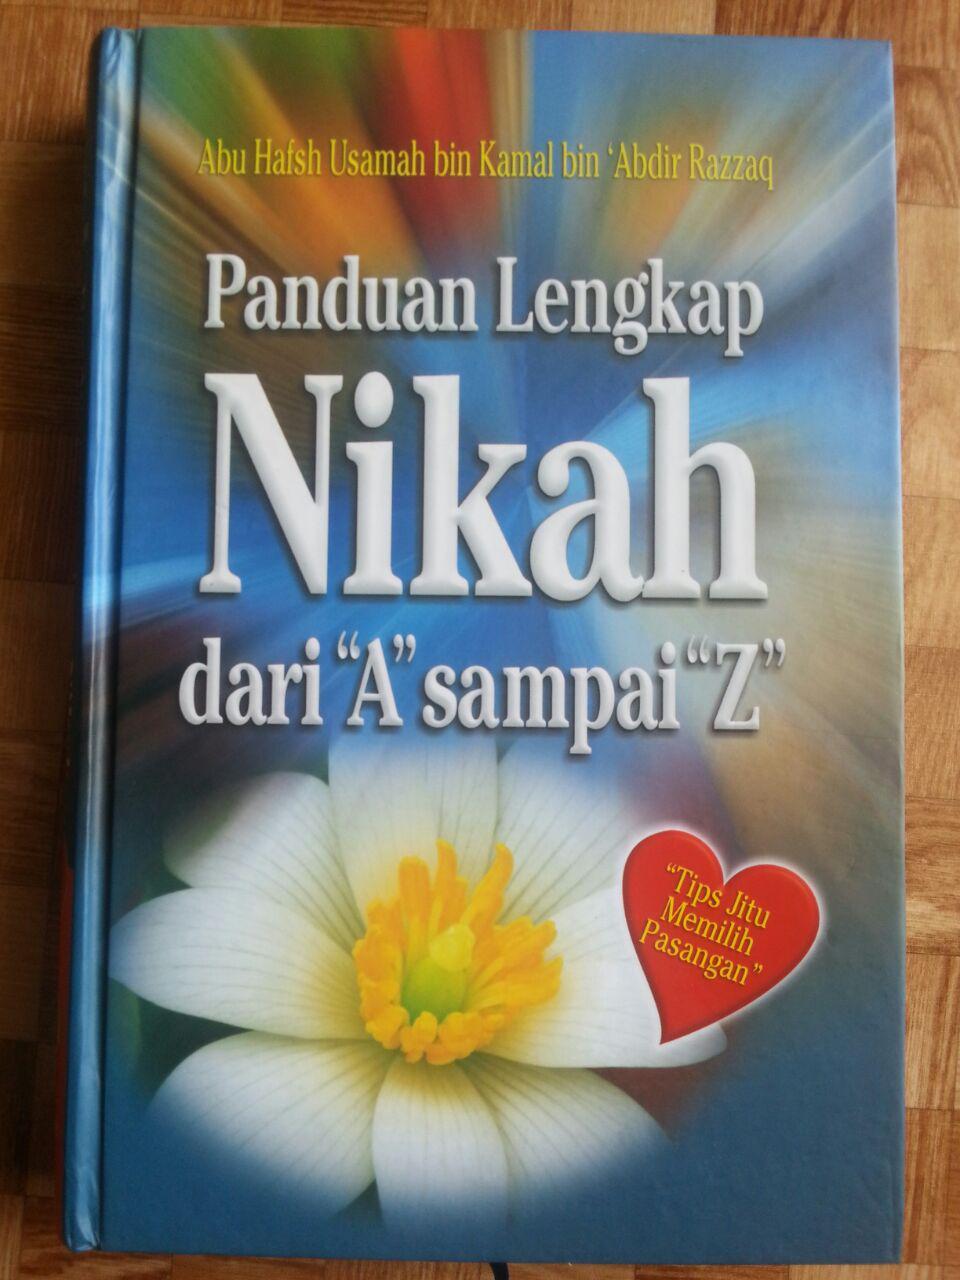 Buku Panduan Lengkap Nikah Dari A Sampai Z cover 2